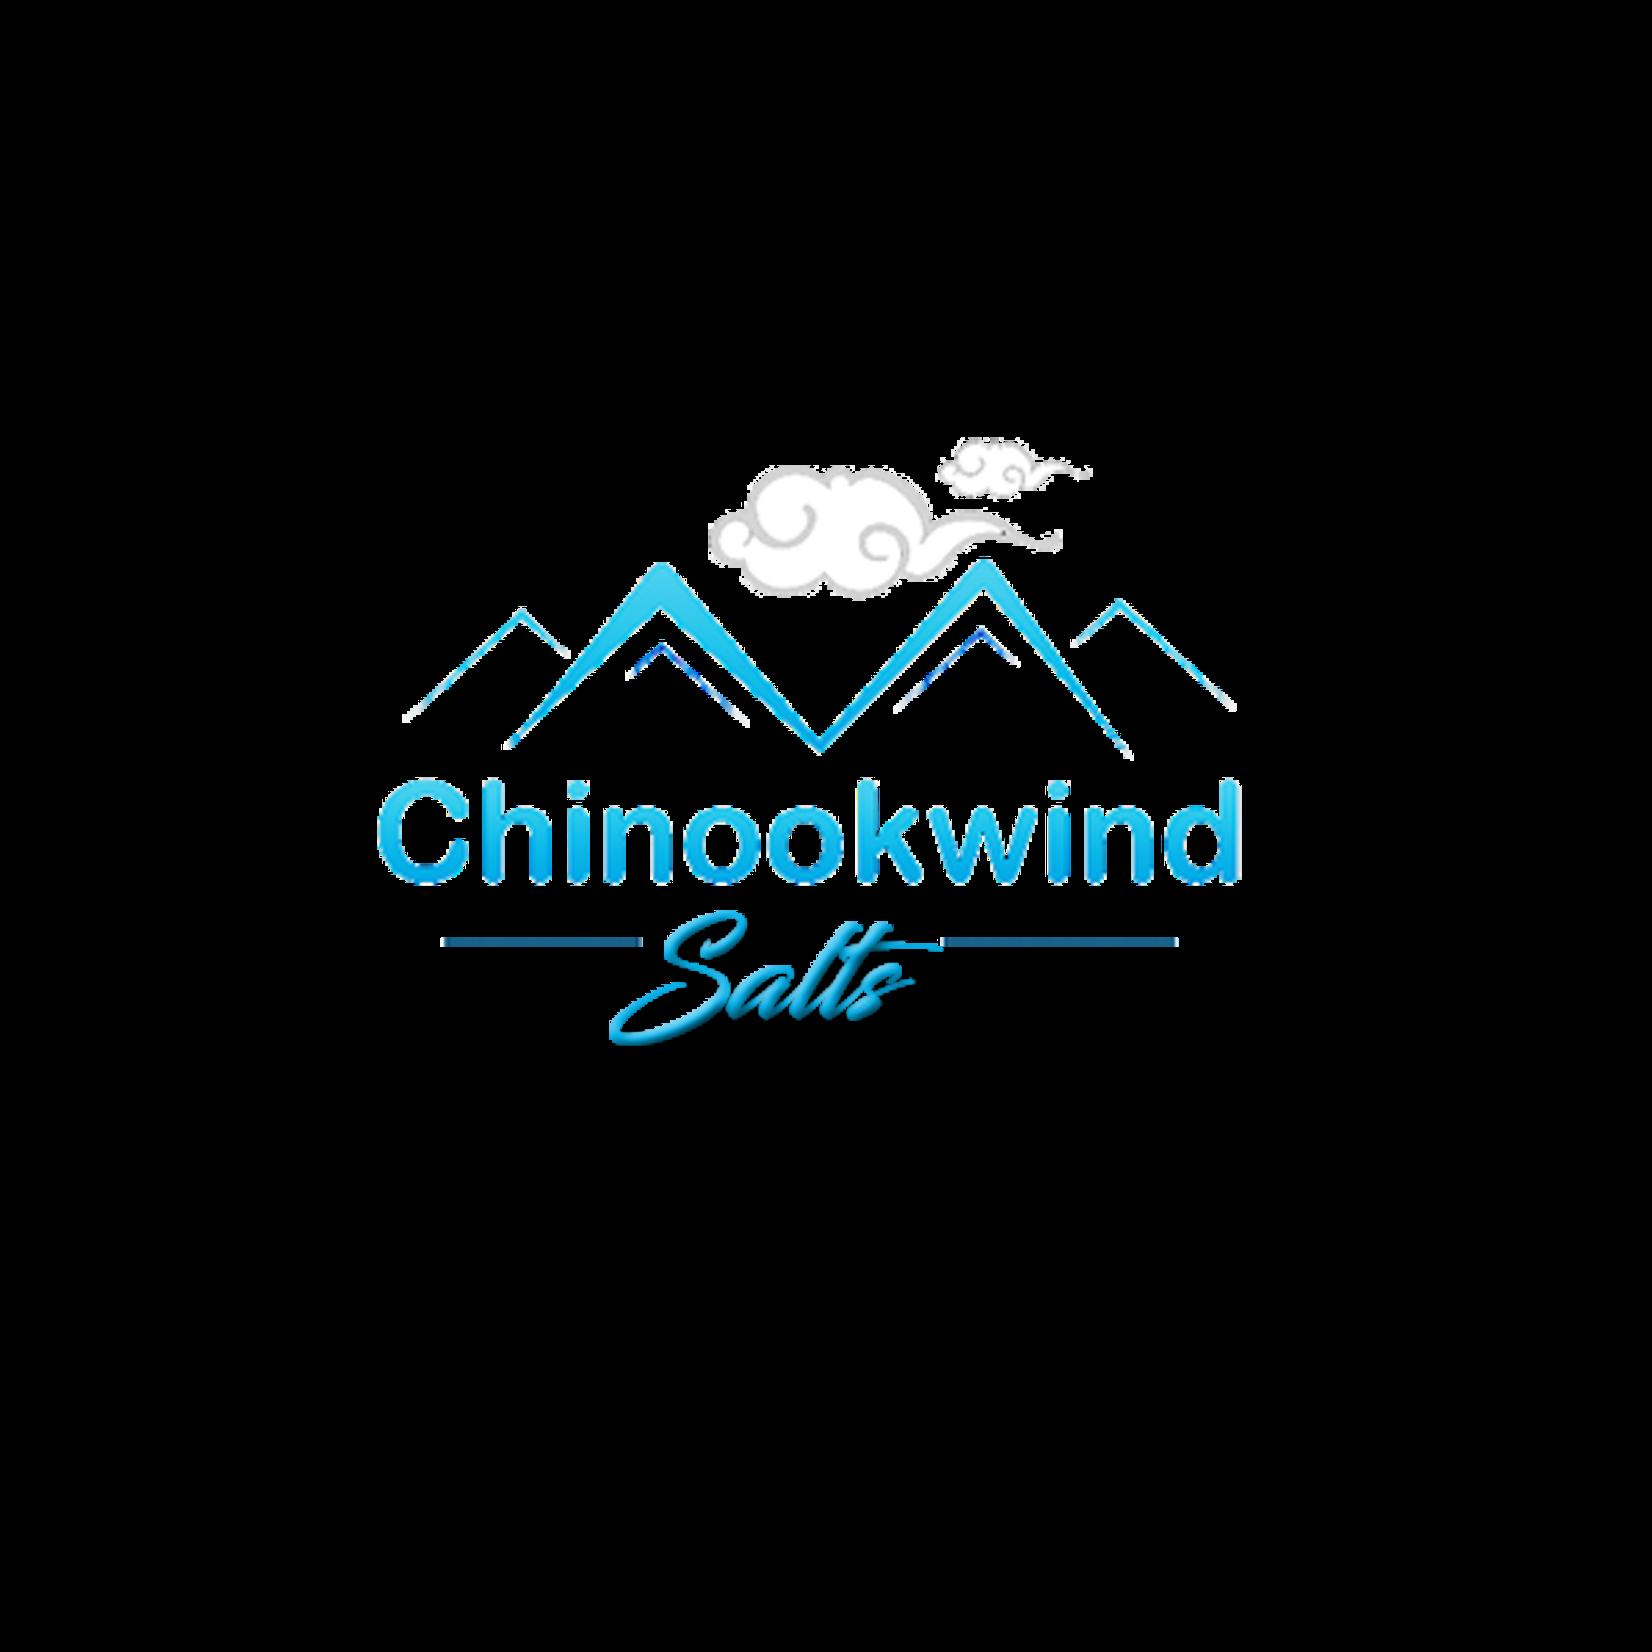 Chinookwind Vapor Fuzzy Peach Salt